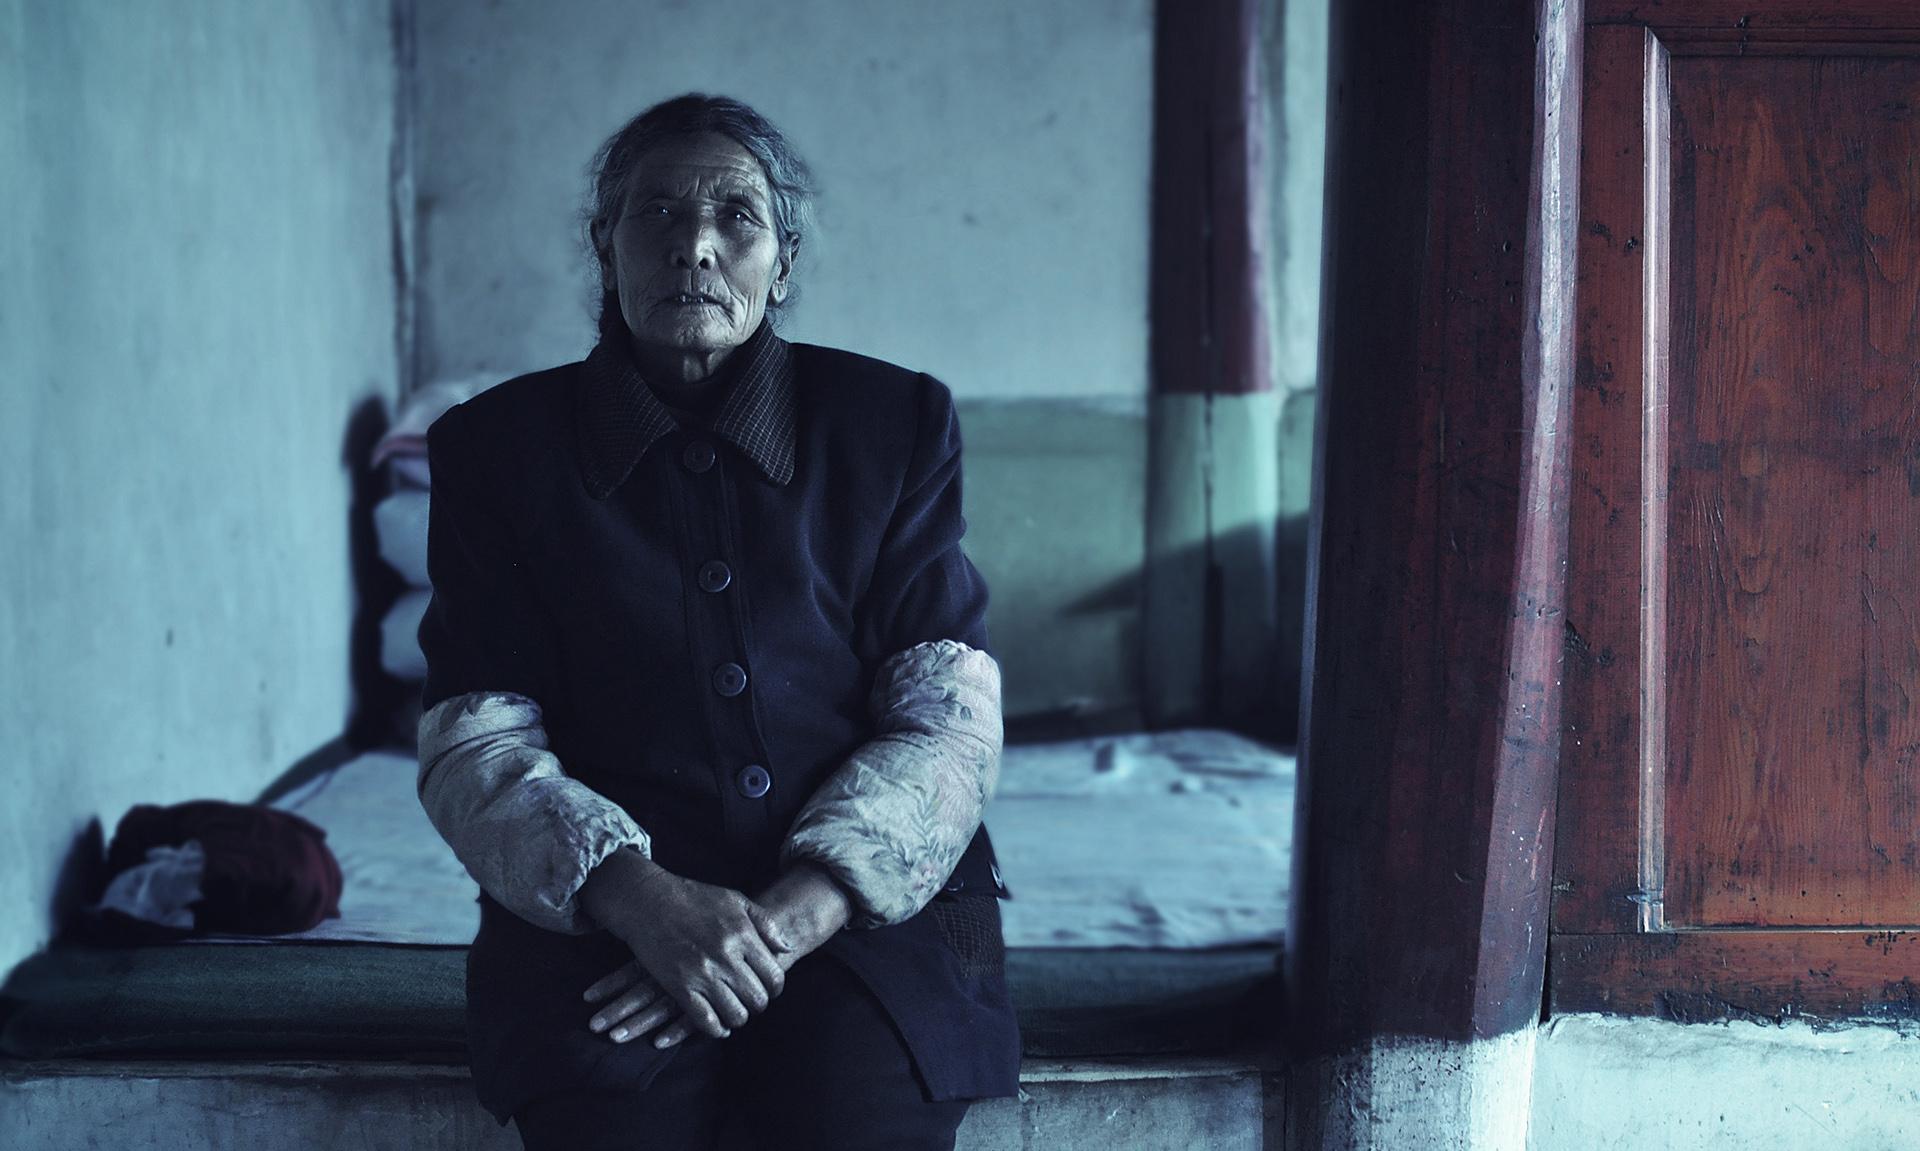 amdo-tibet-portrait.jpg